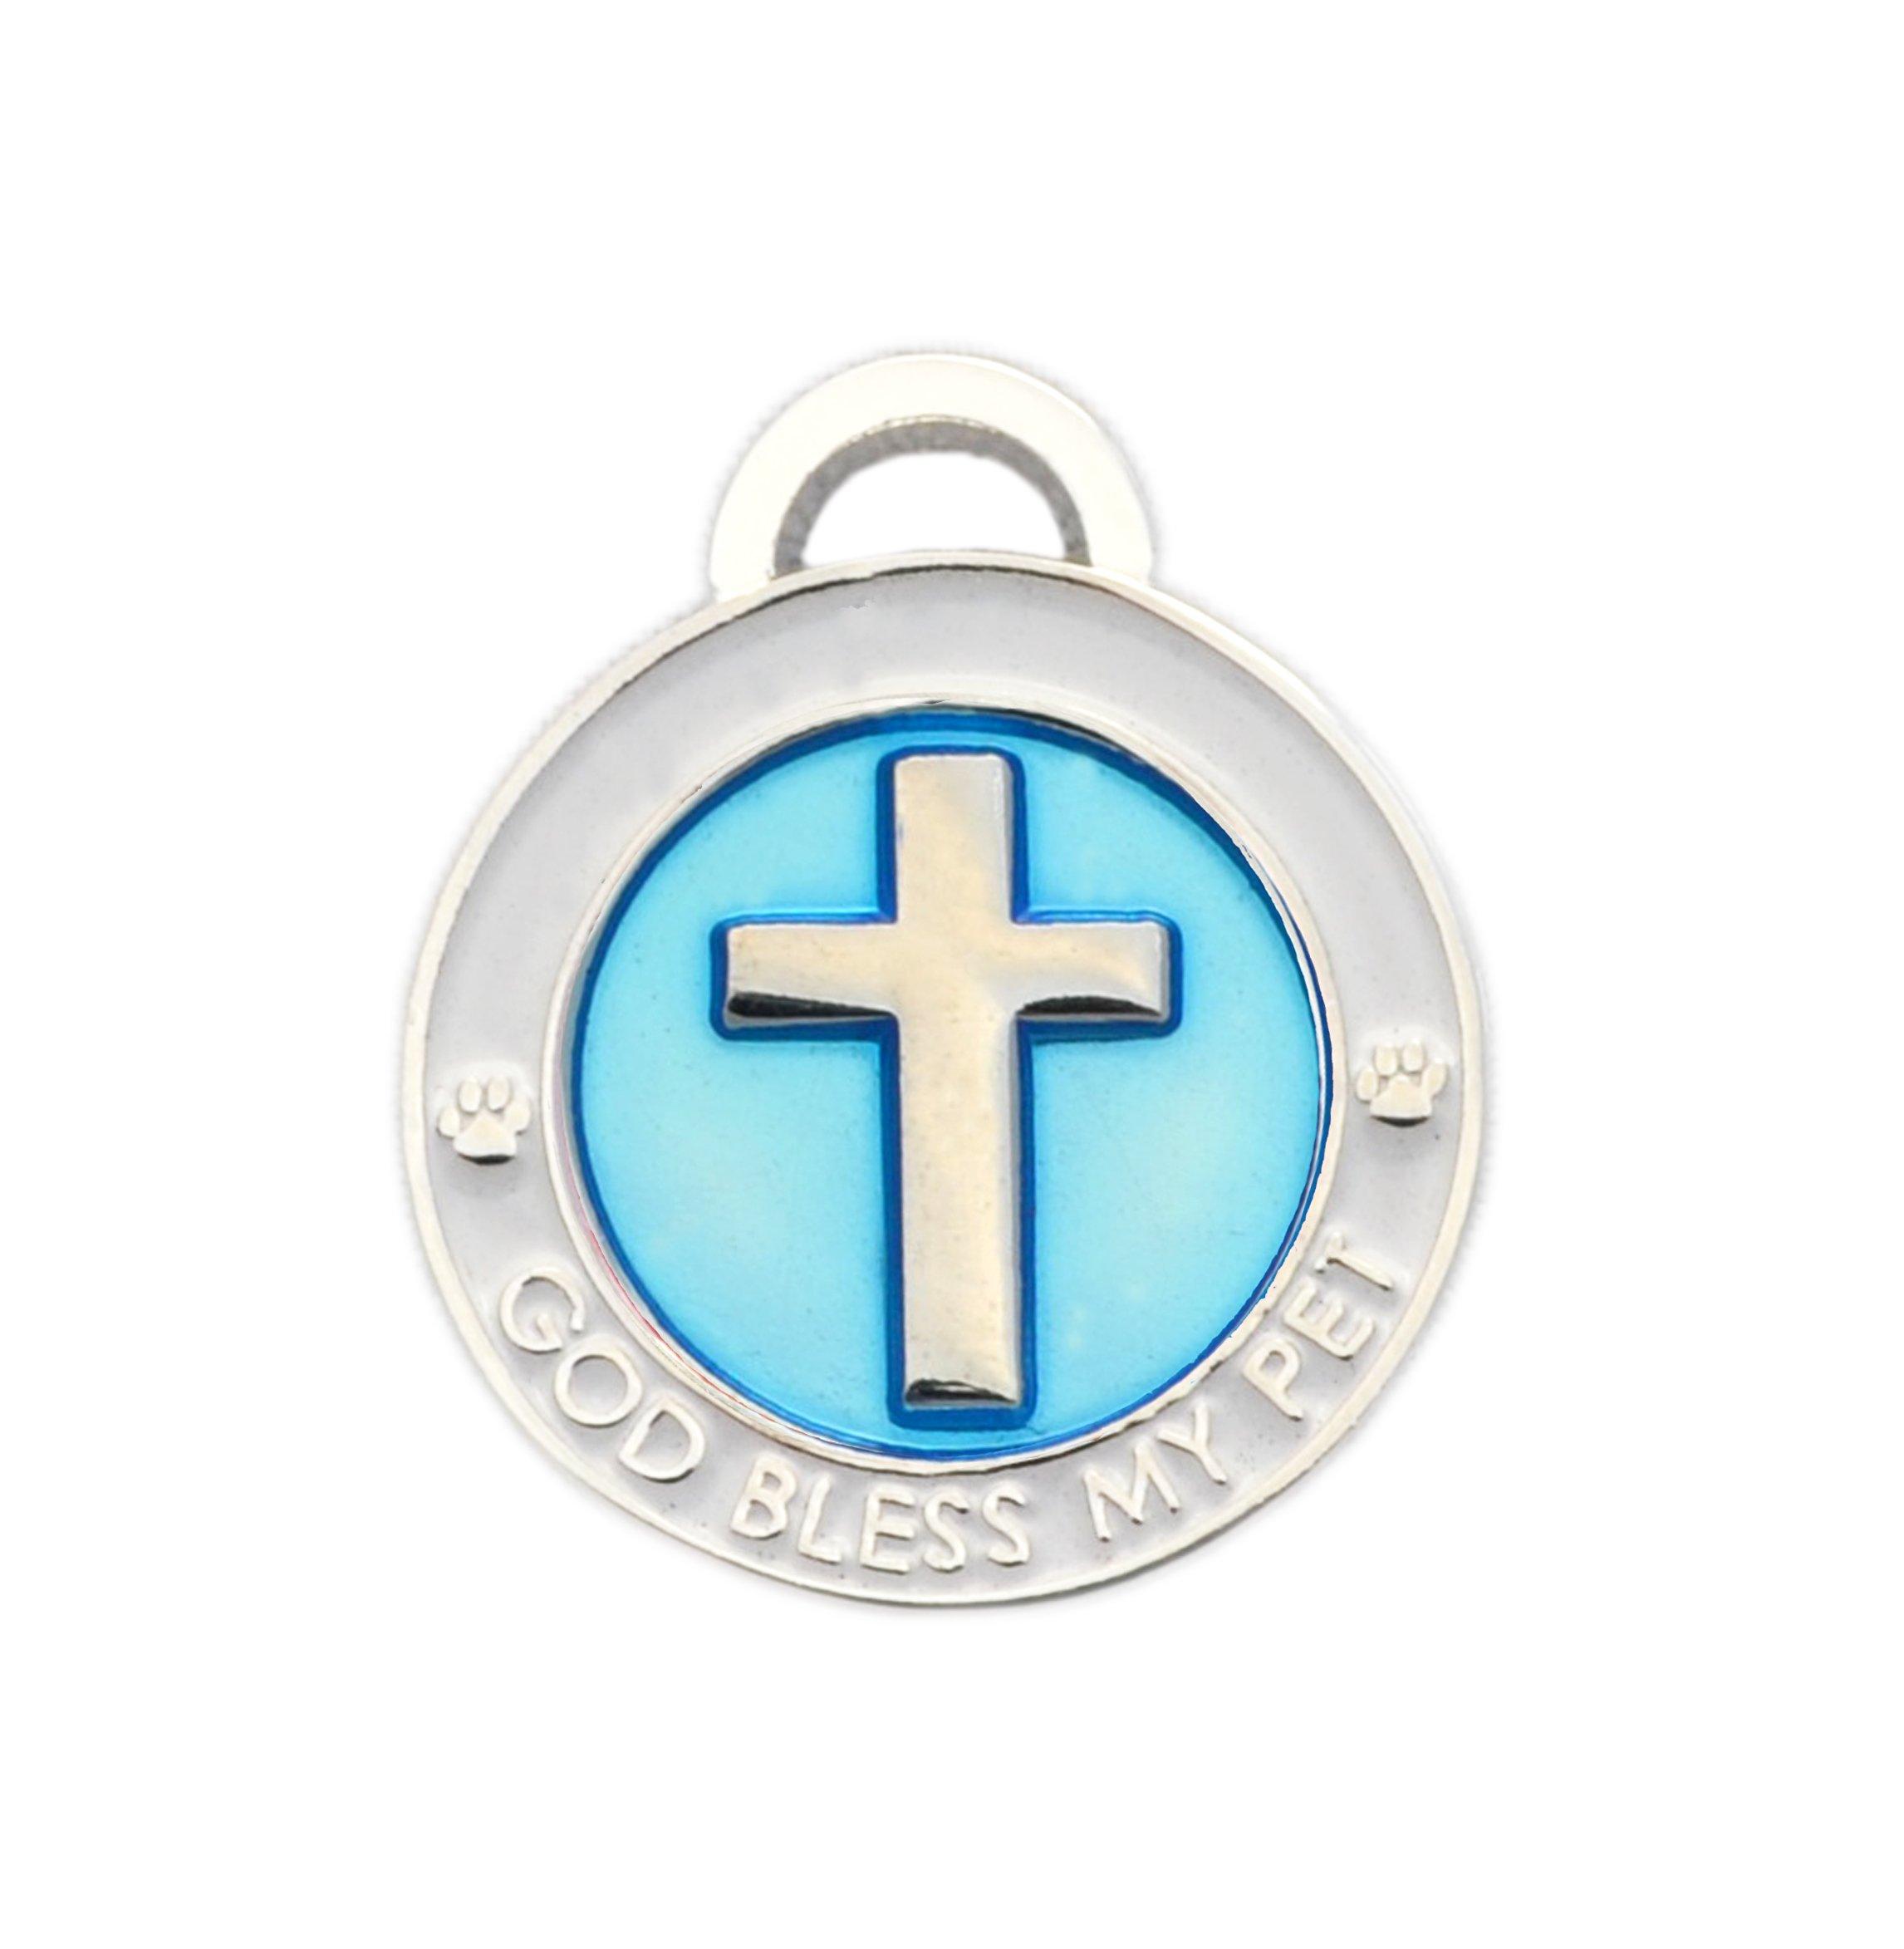 Luxepets Pet Collar Charm, Cross, Small, Blue